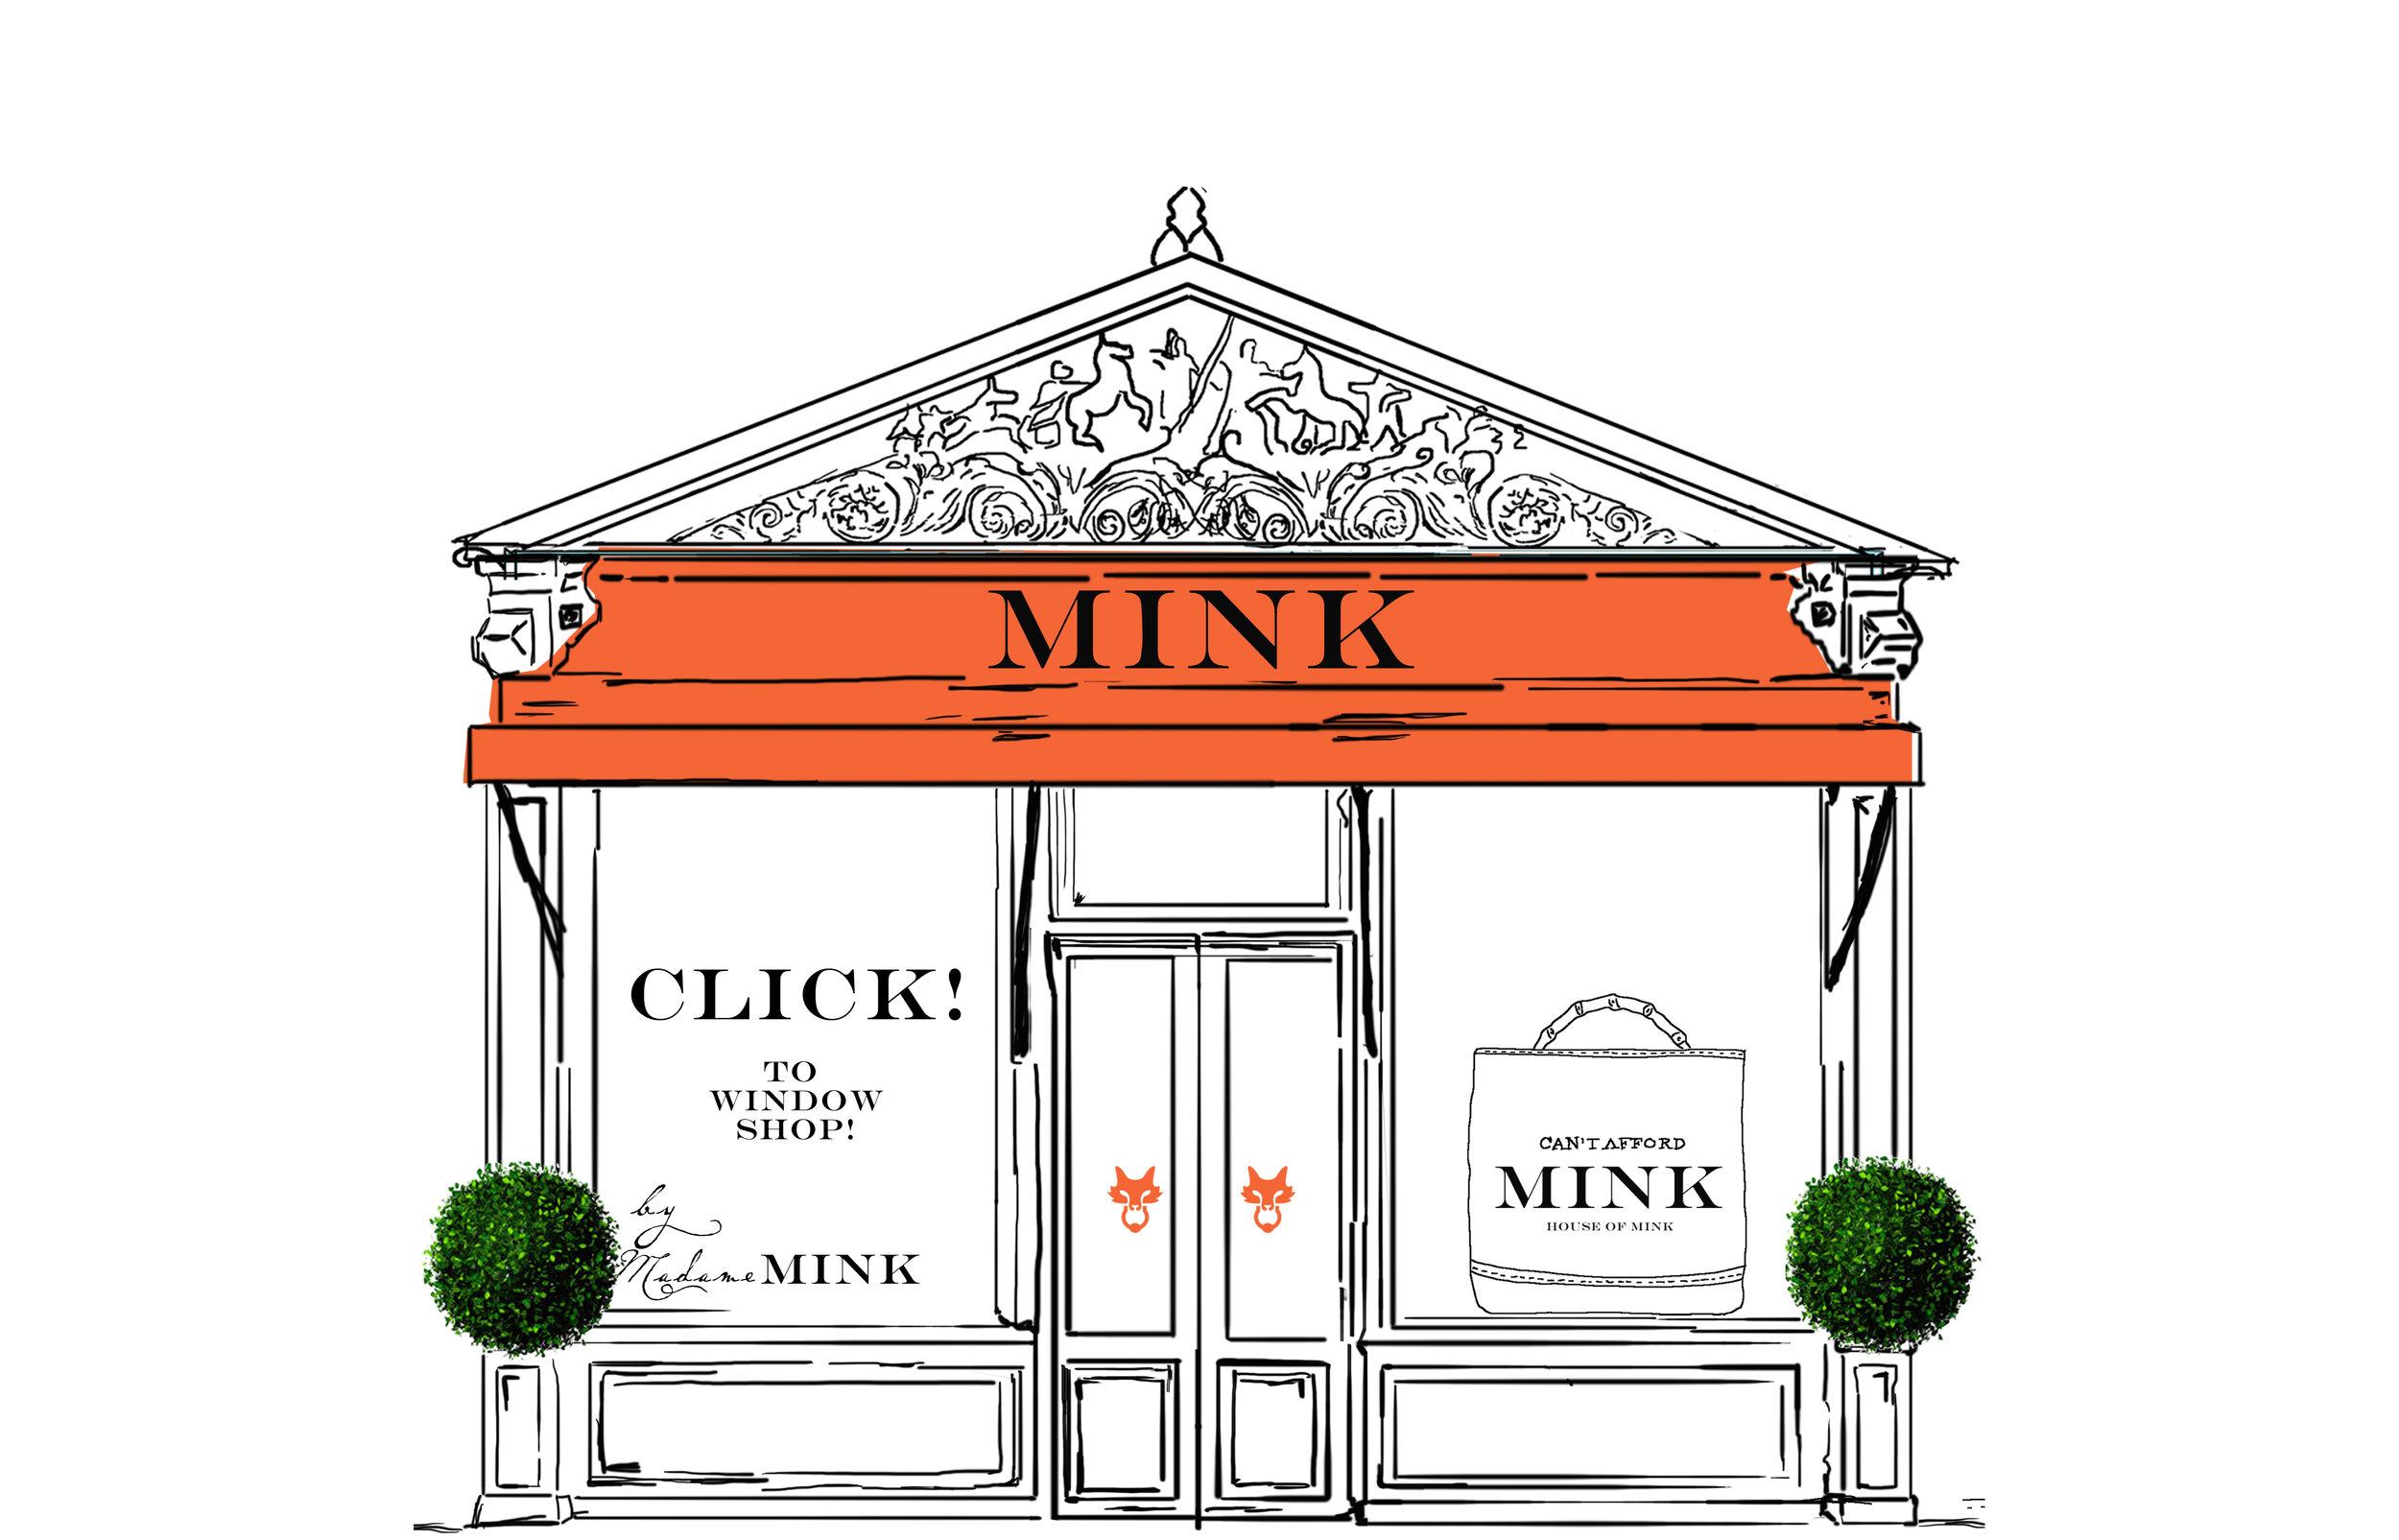 mink_housebuilding12_wo1.jpg